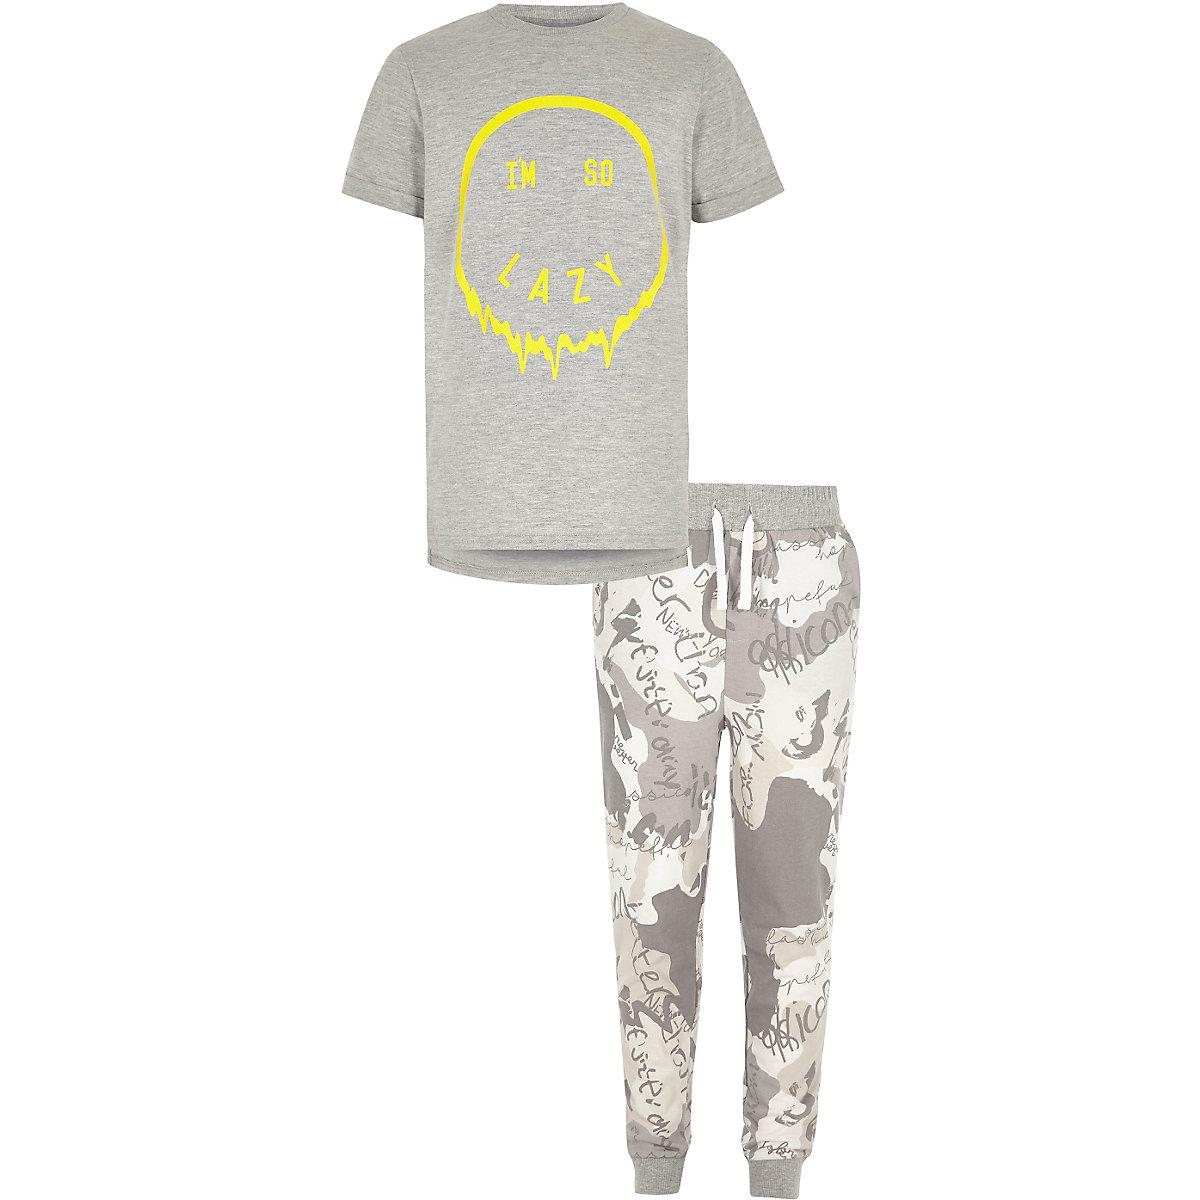 Boys grey 'I'm so lazy' pajama set